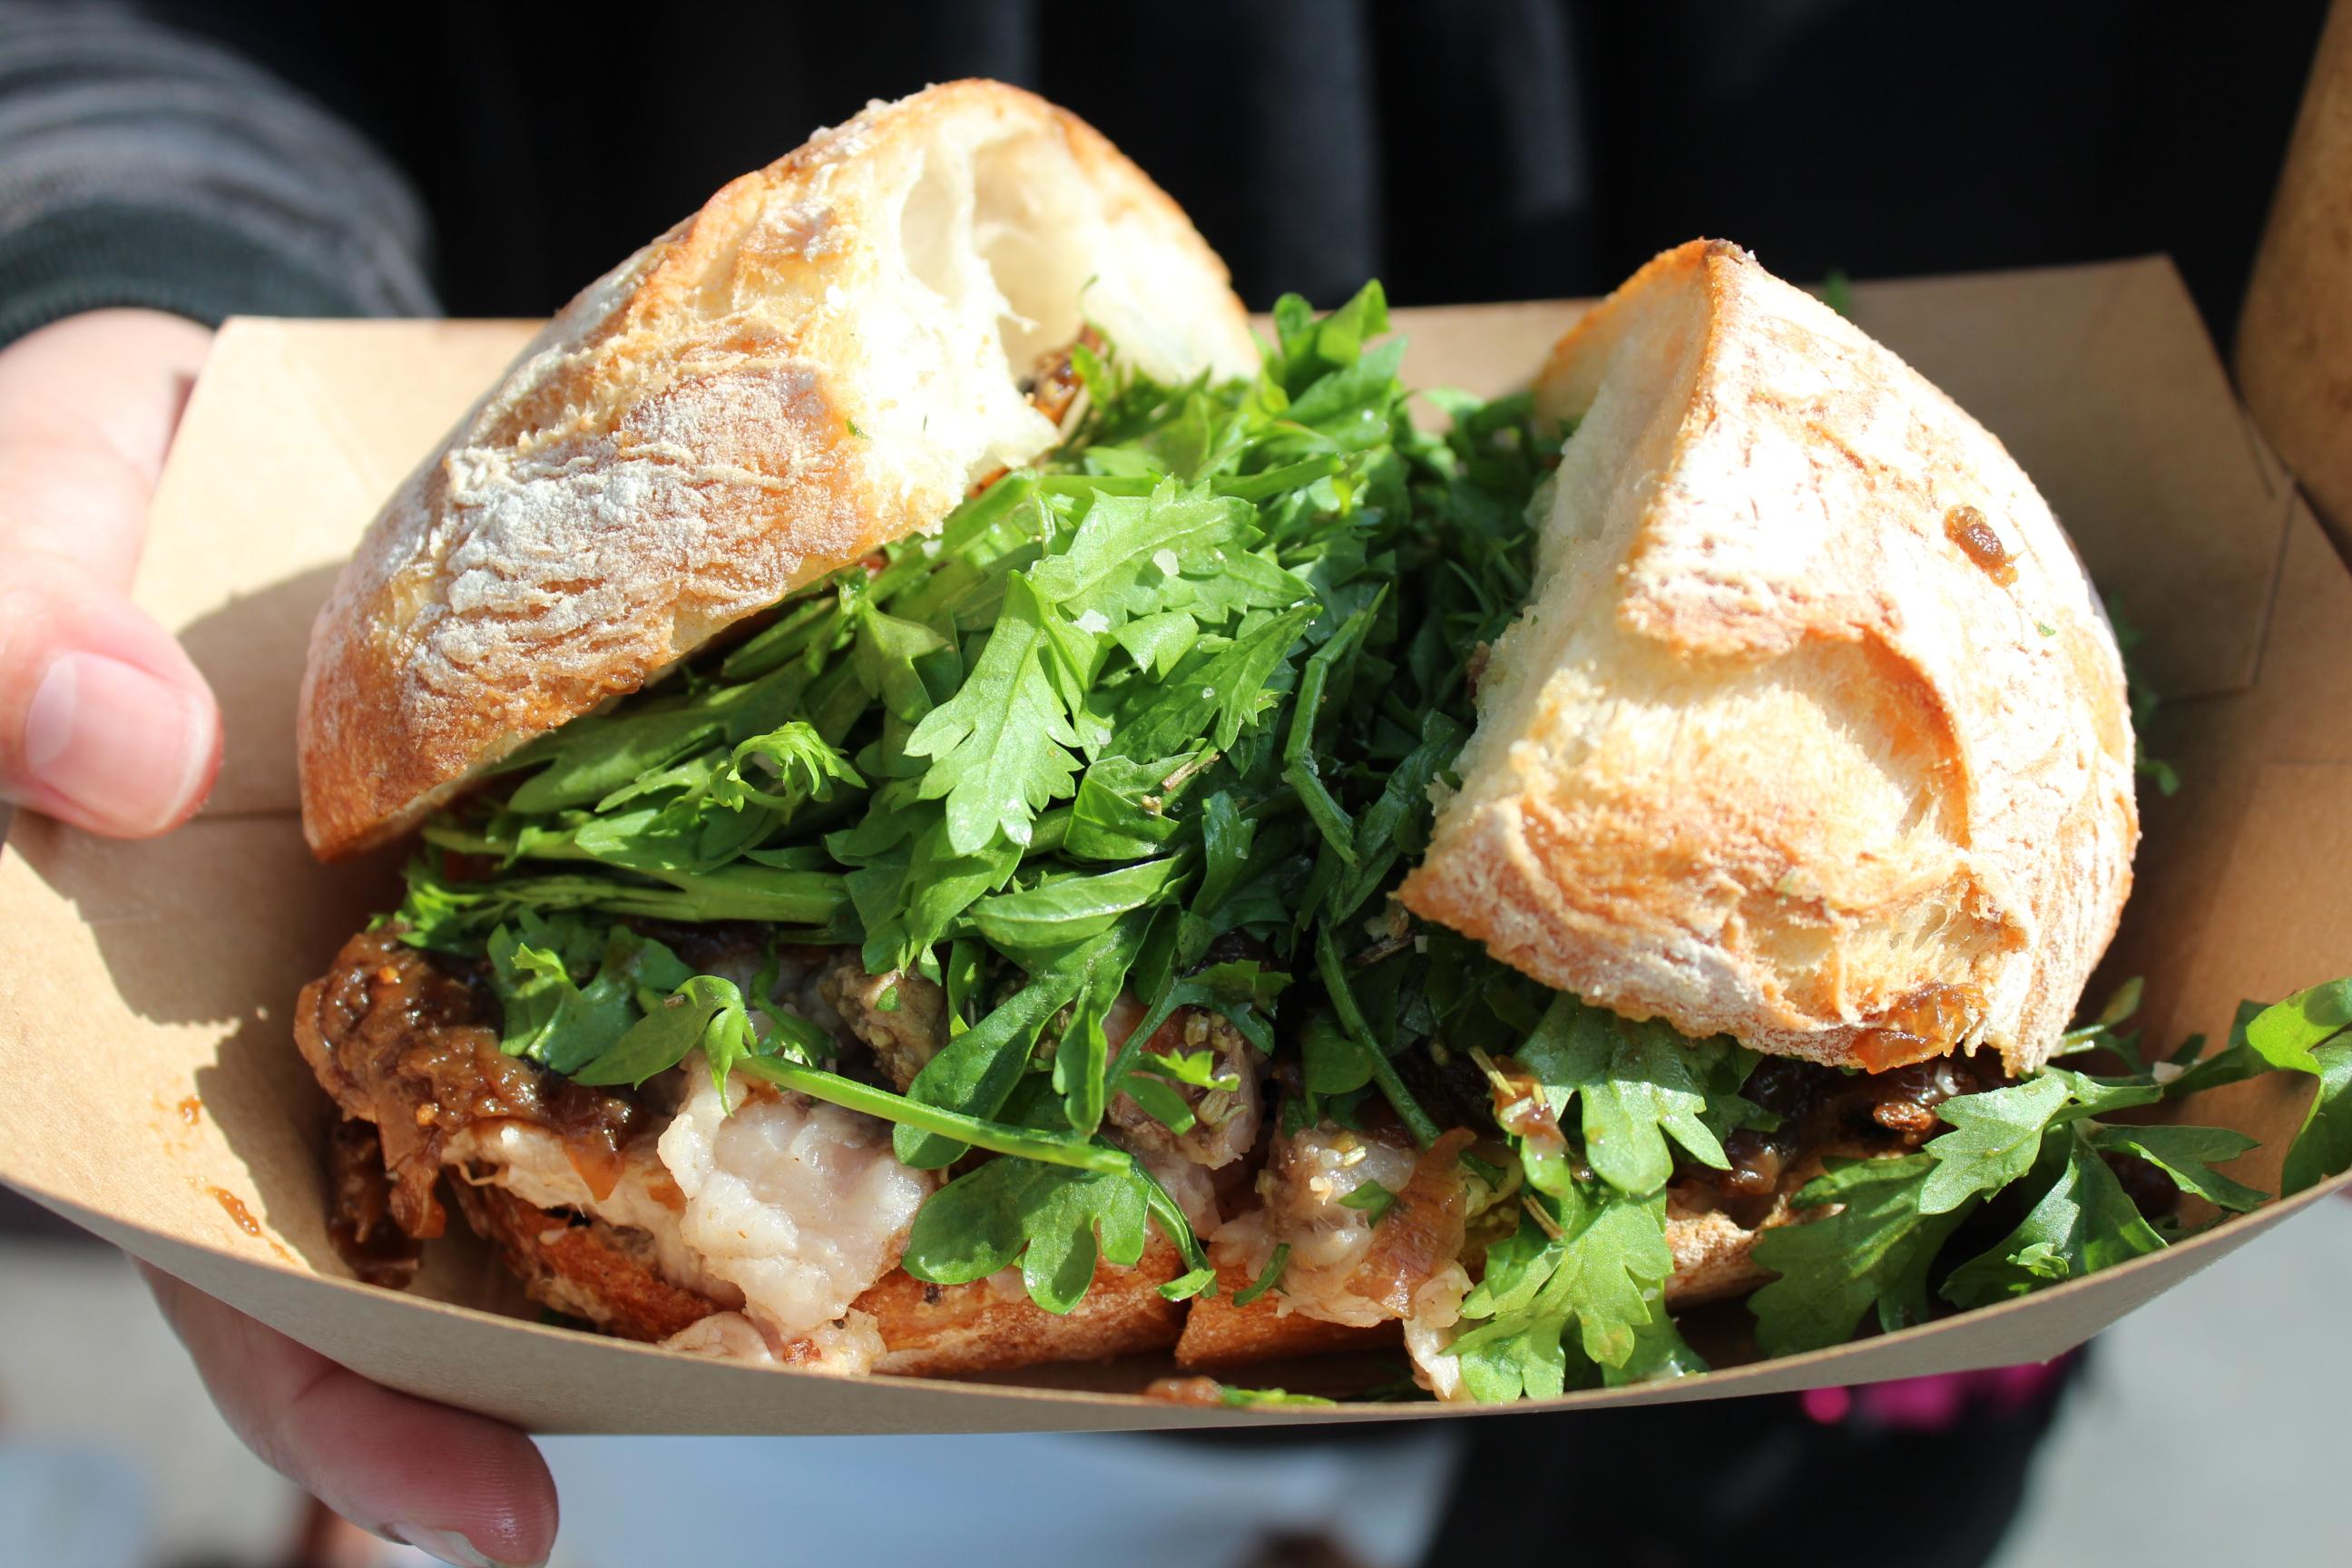 sofa farmers market san jose springfield convertible reviews porchetta chronicles of a beauty foodie